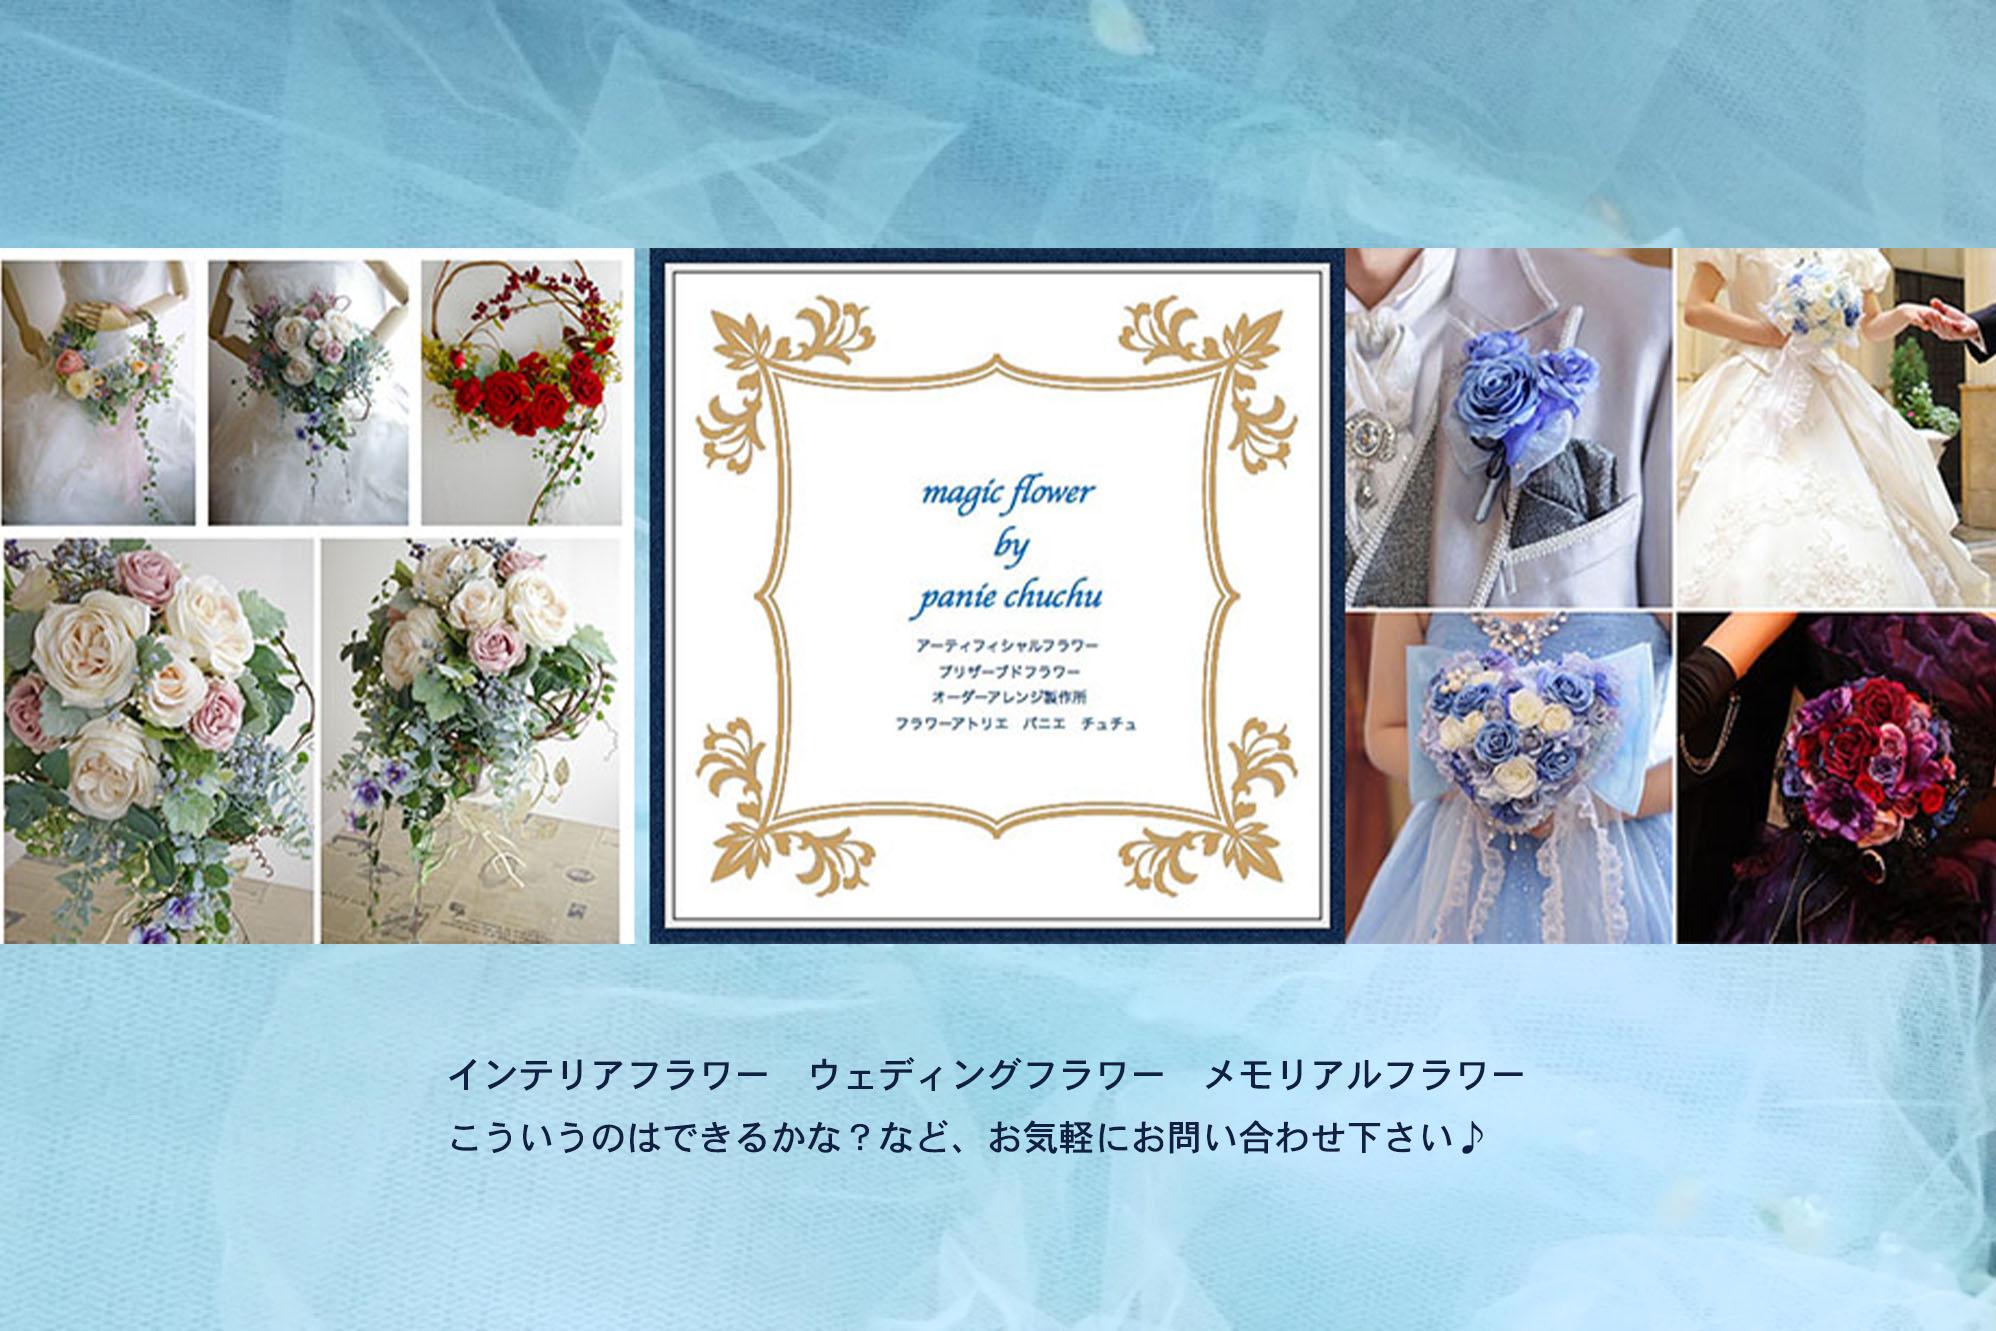 Magic flower by panie chu chu       (フラワーアトリエ パニエ チュチュ)